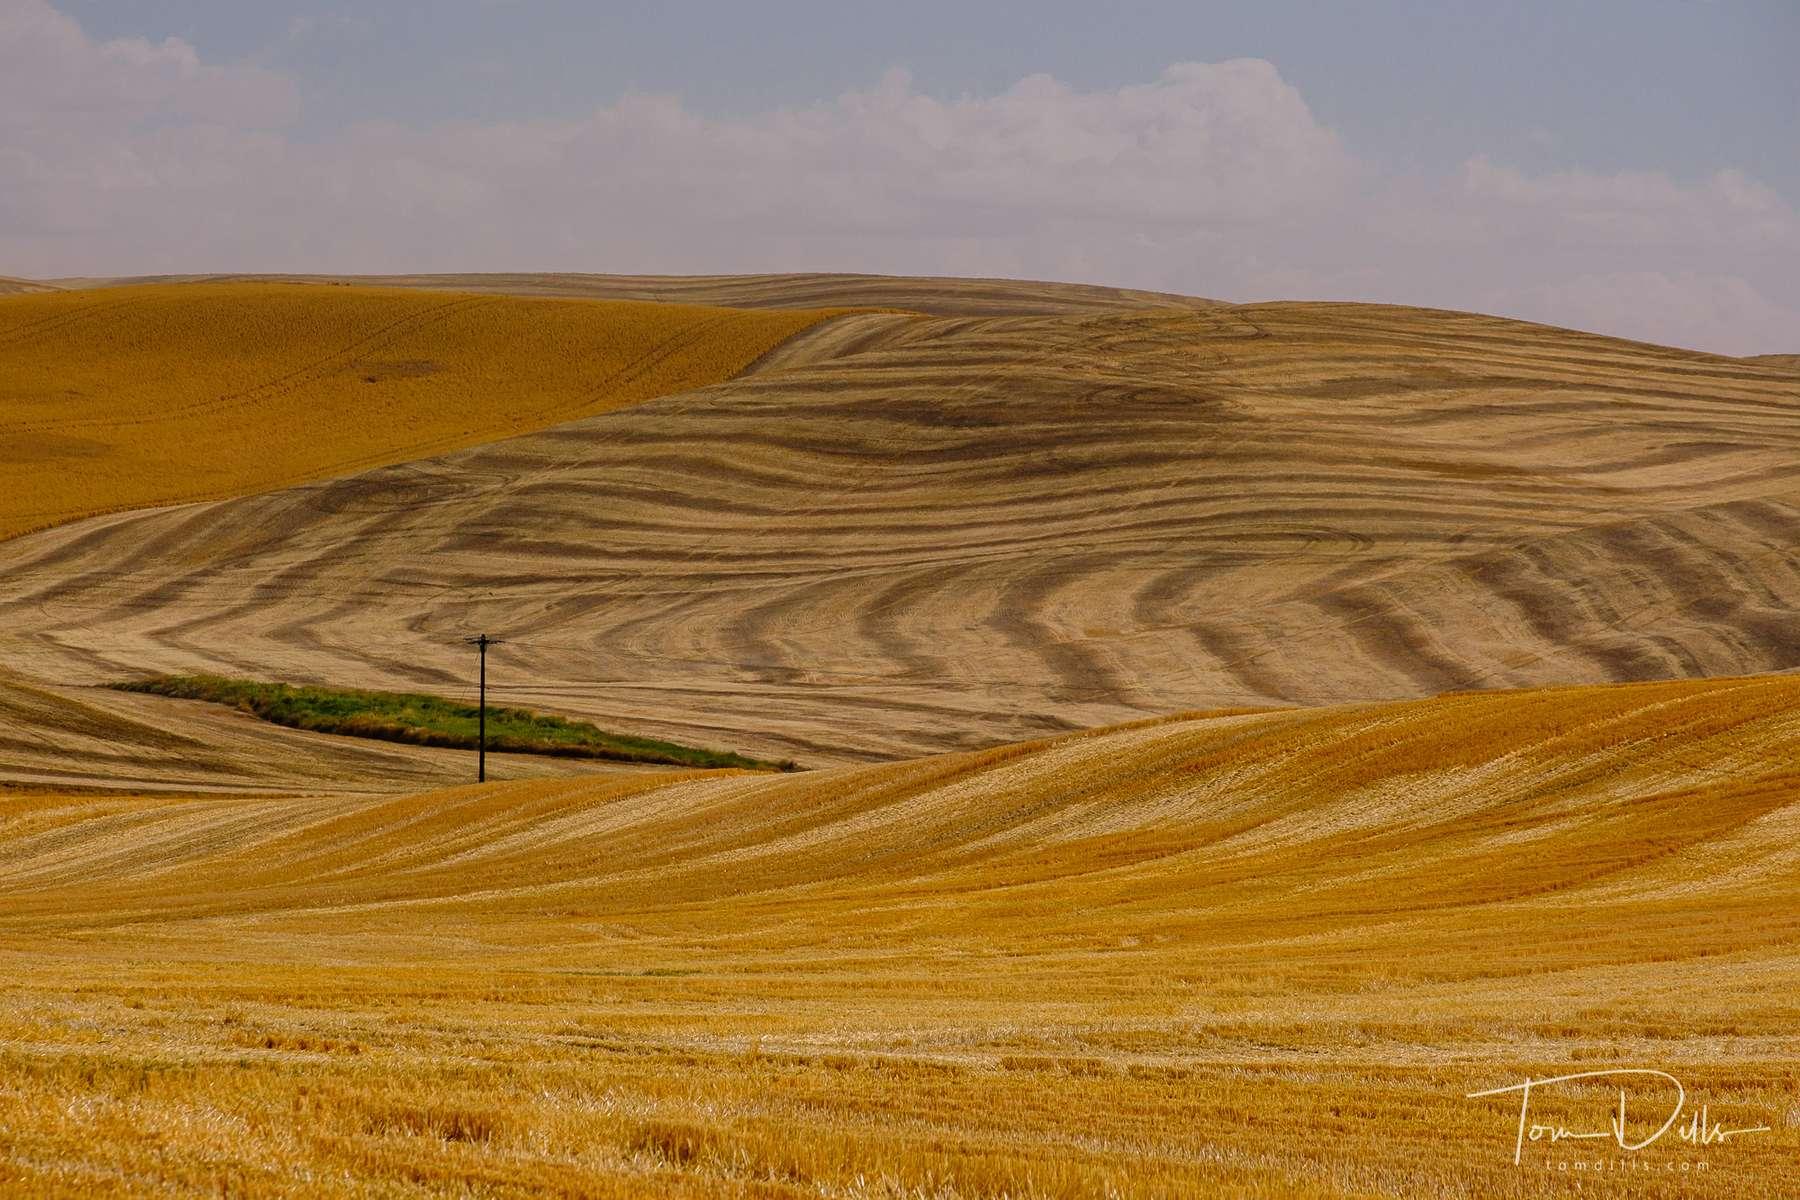 Rural countryside along SR 26 in southeastern Washington